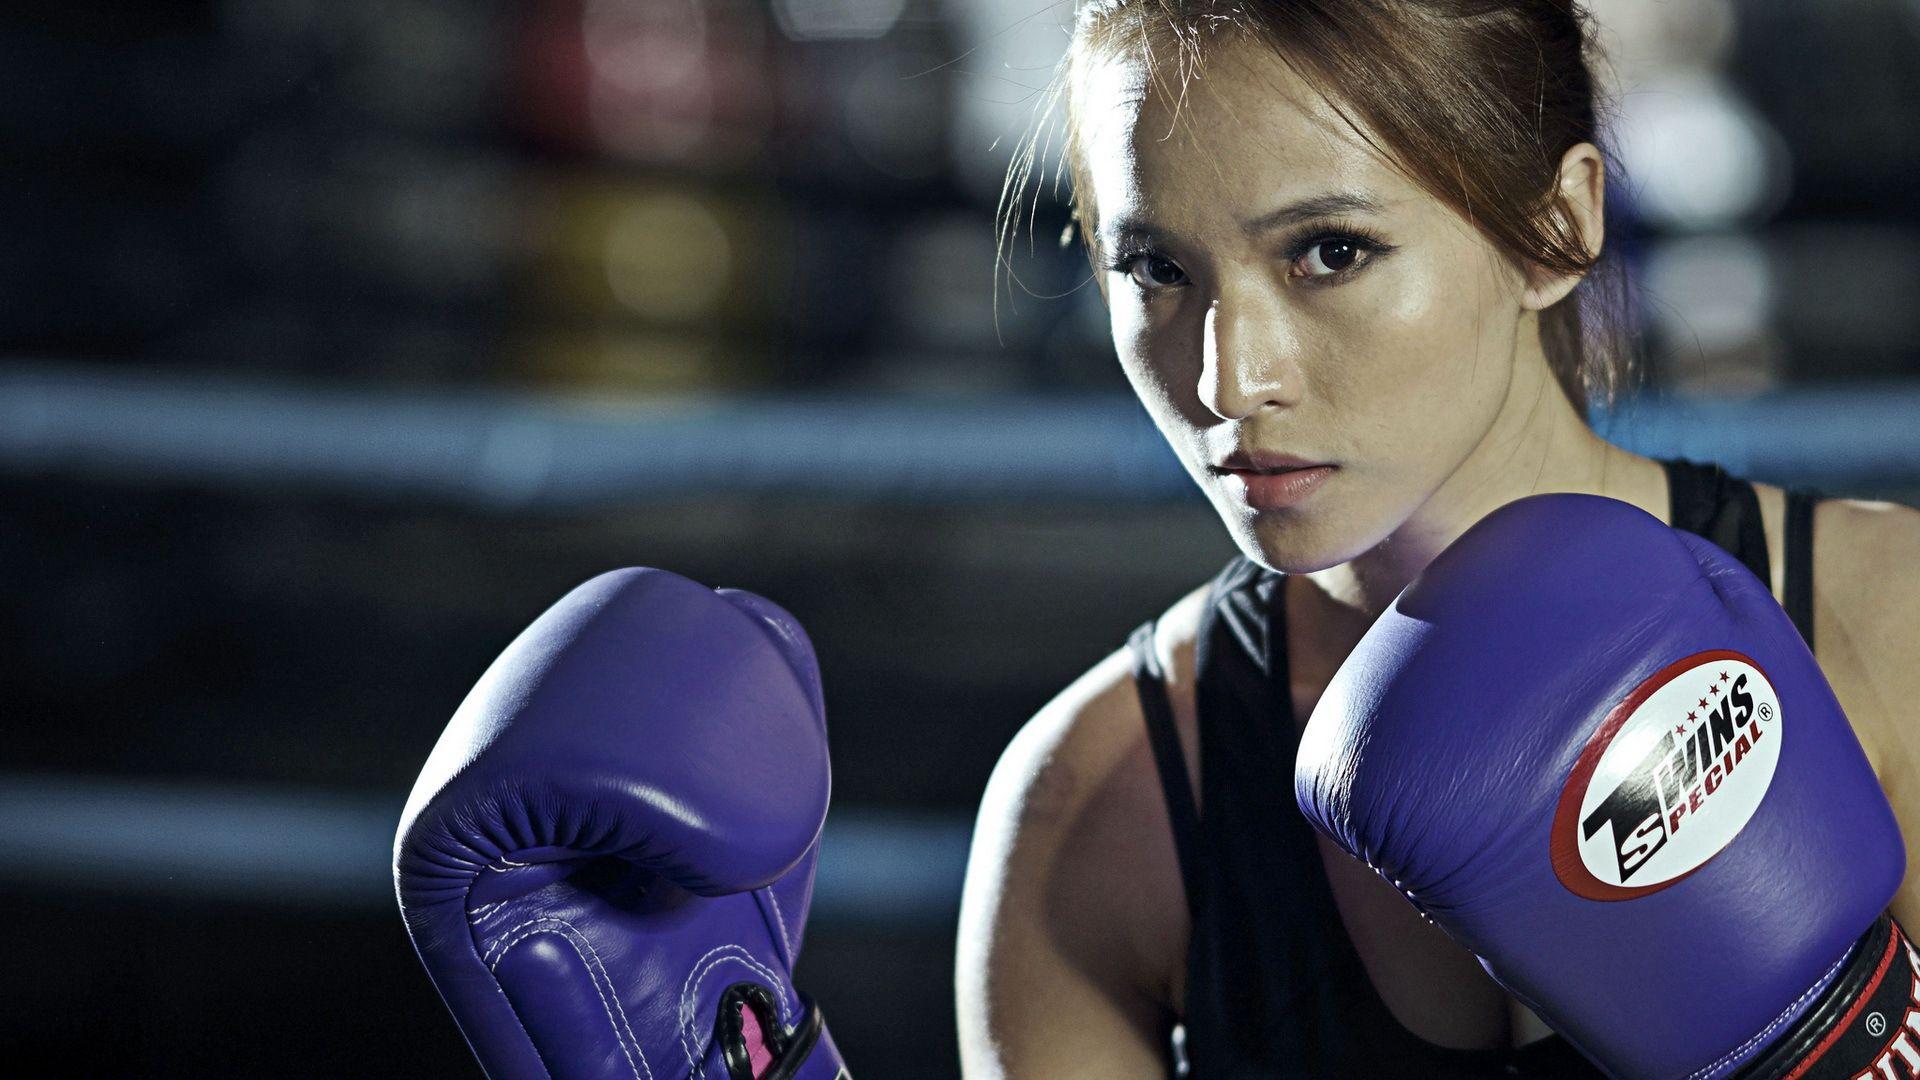 Boxing free hd wallpaper